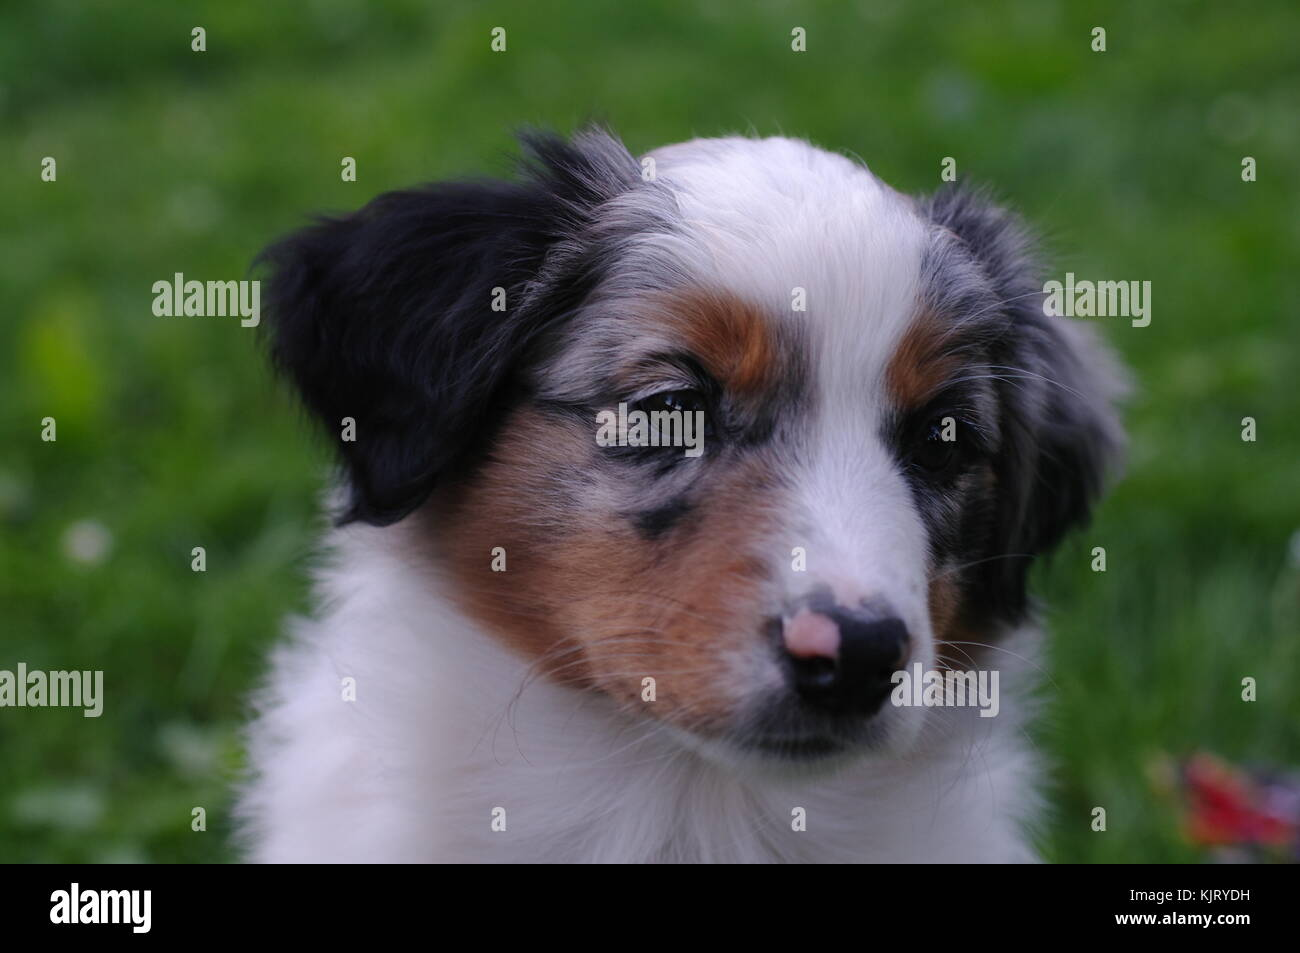 Australian Shepherd Dog Puppy Stock Photo Alamy